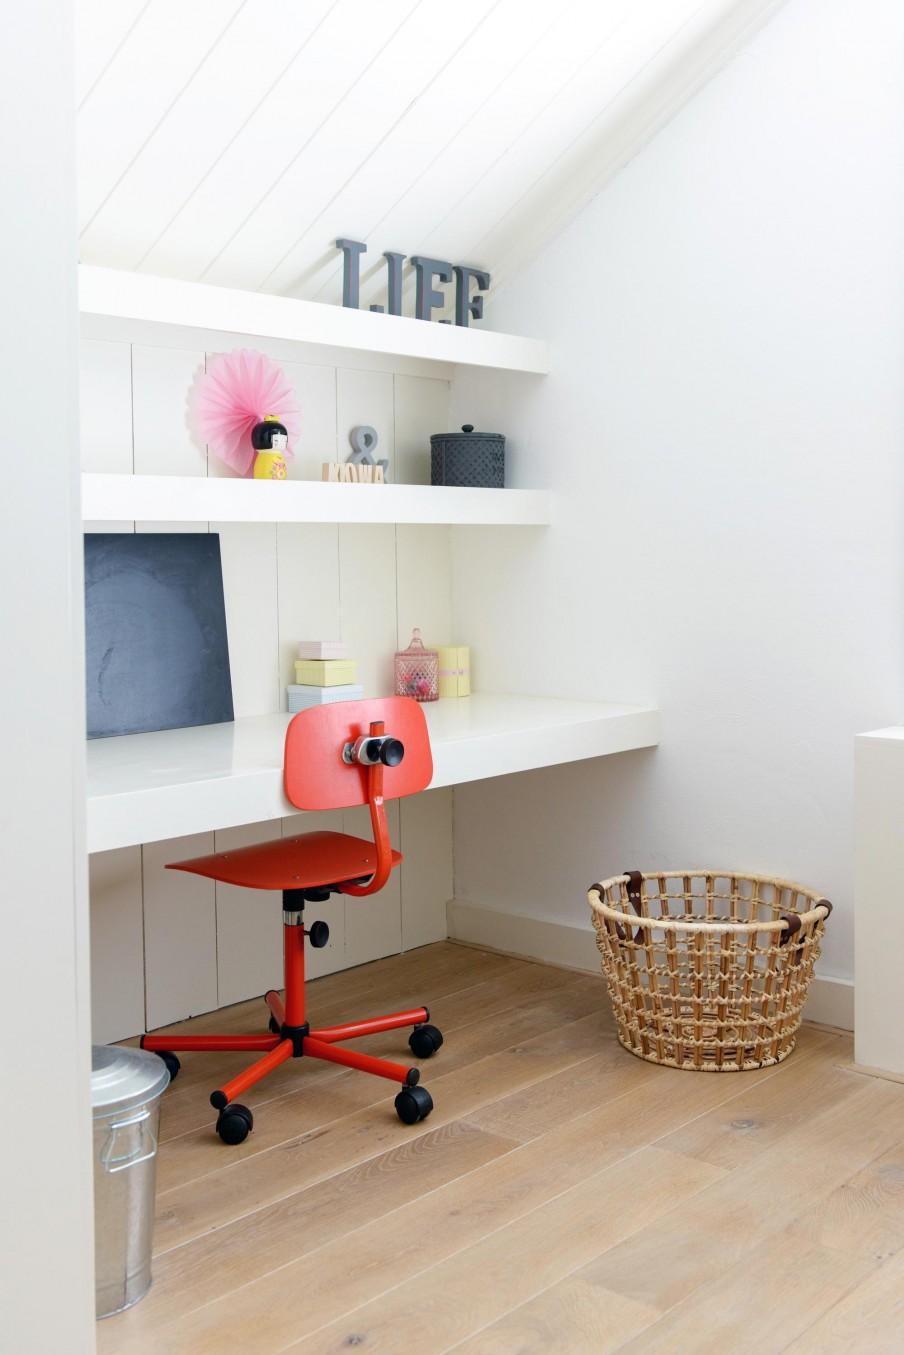 une maison scandinave pep 39 sy mariekke. Black Bedroom Furniture Sets. Home Design Ideas